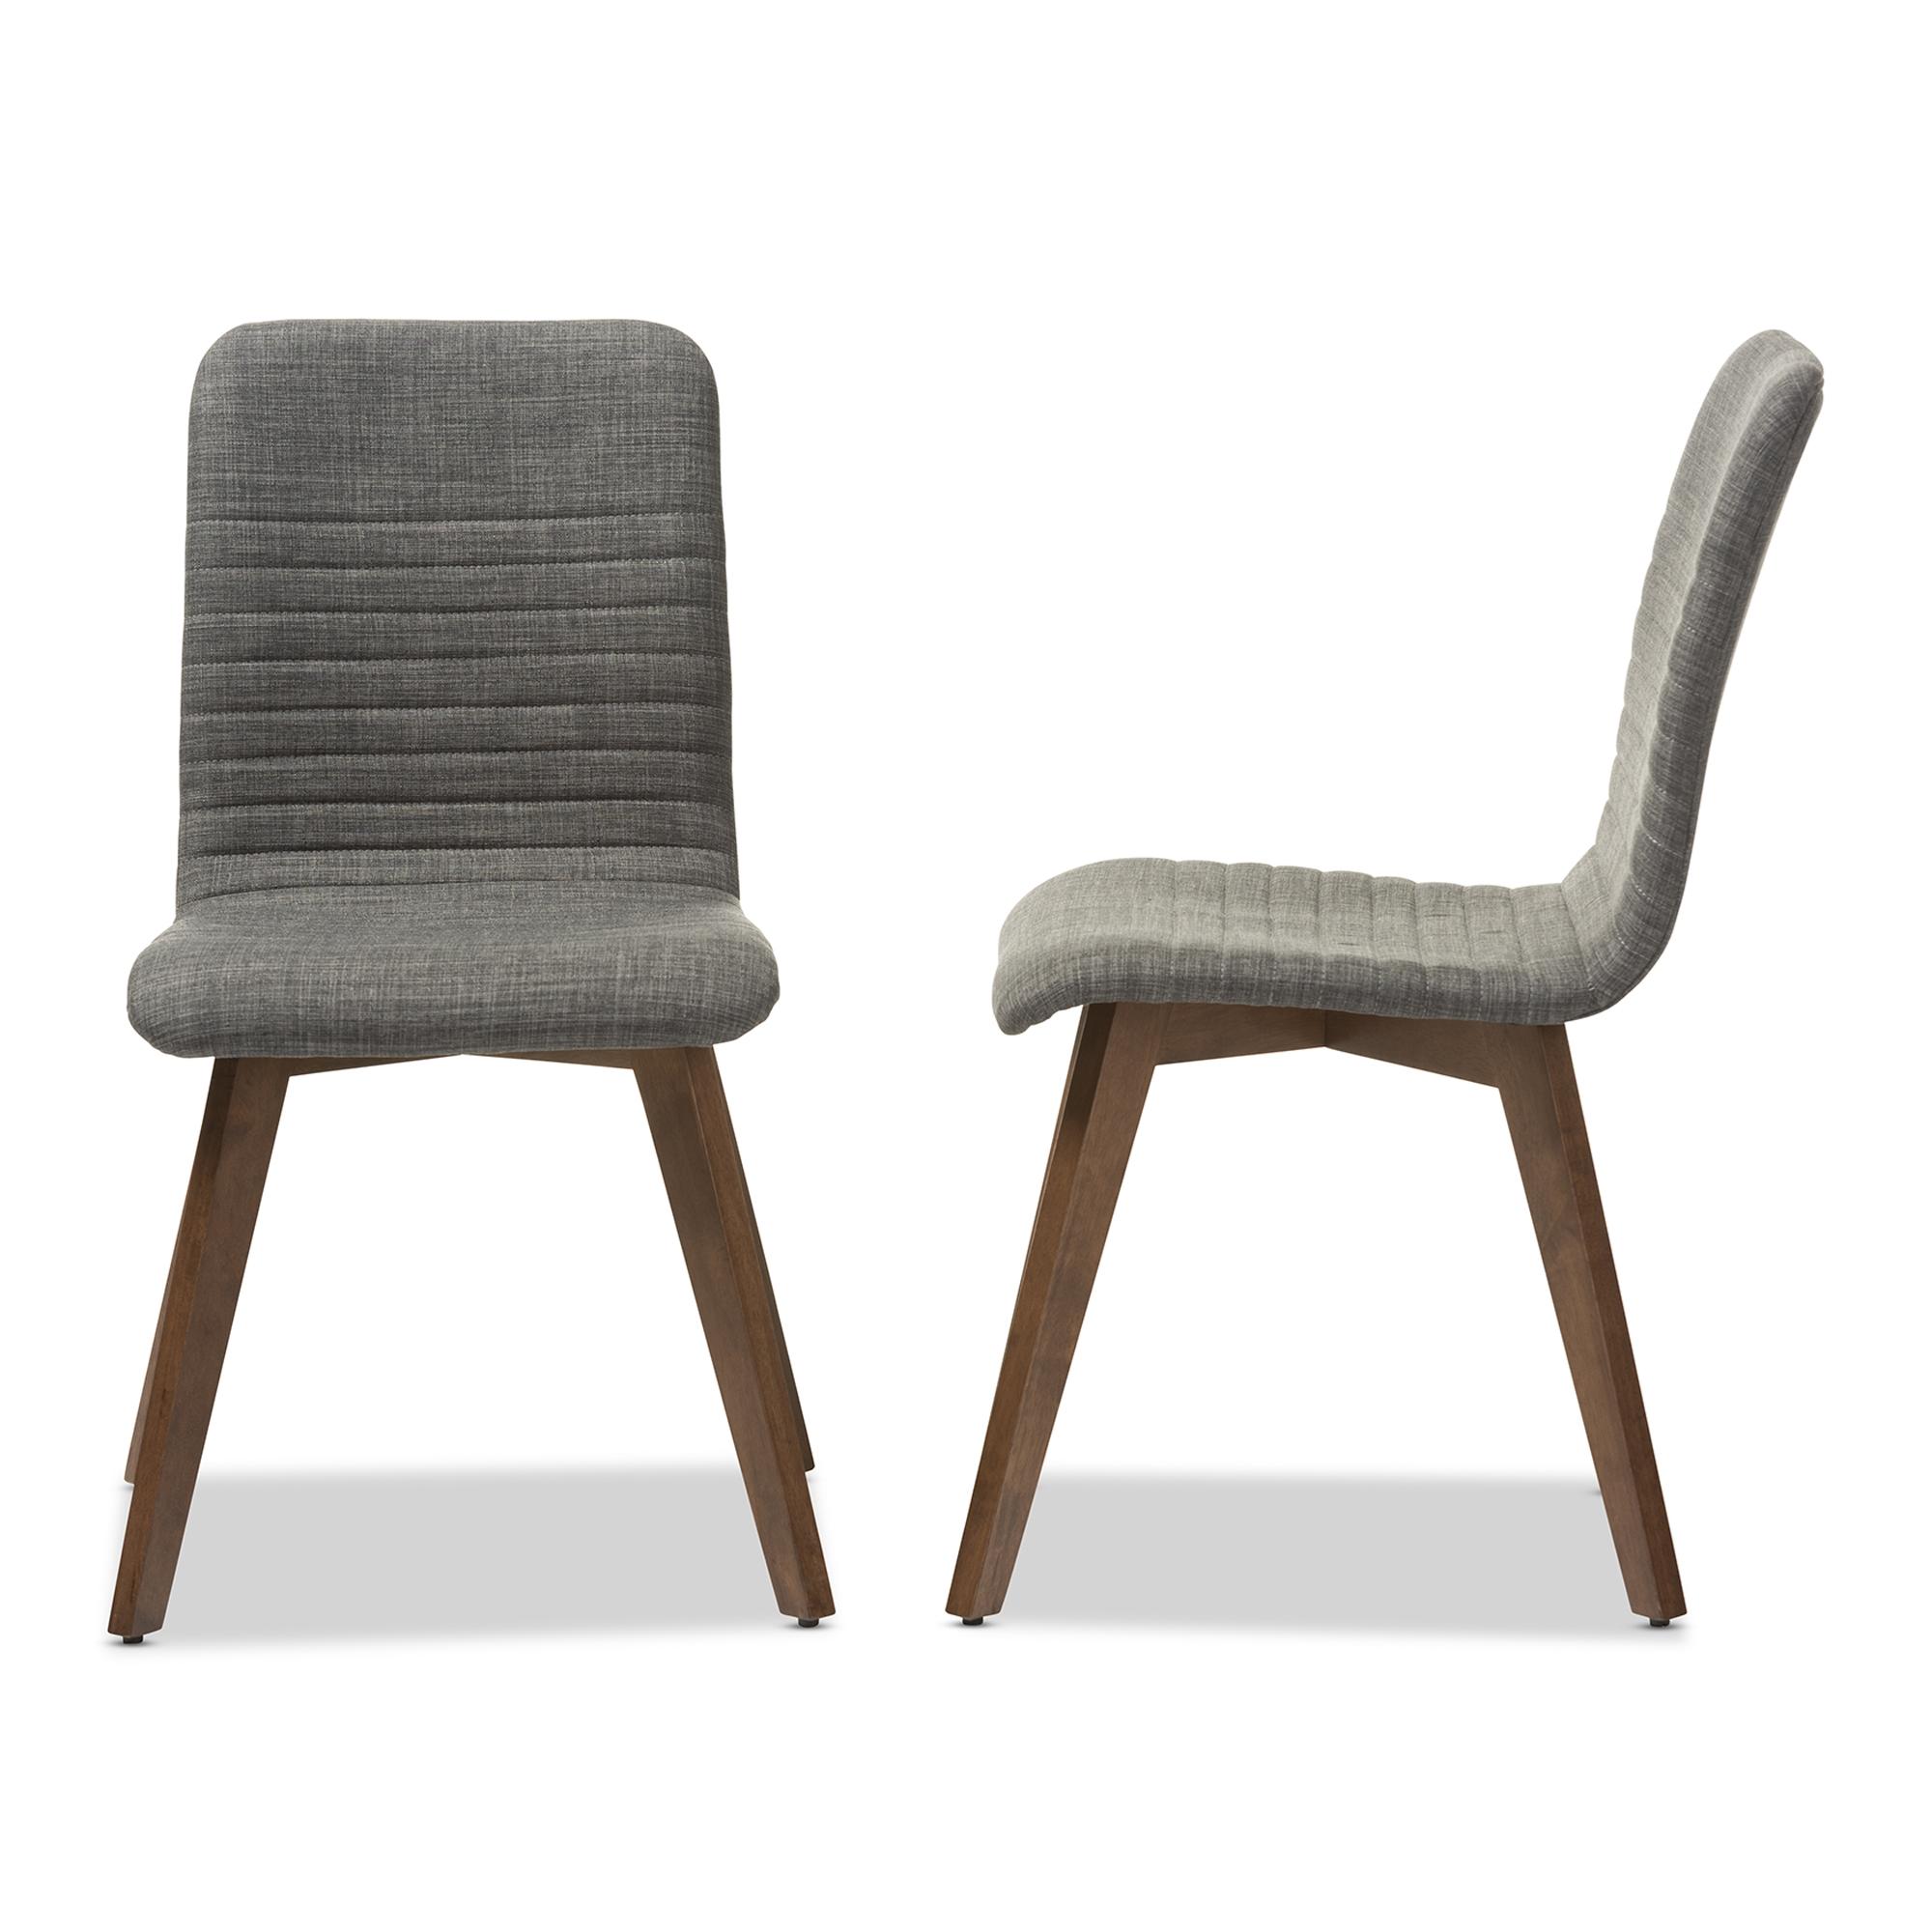 Baxton Studio Sugar Mid Century Retro Modern Scandinavian Style Dark Grey  Fabric Upholstered Walnut Wood Finishing Dining Chair